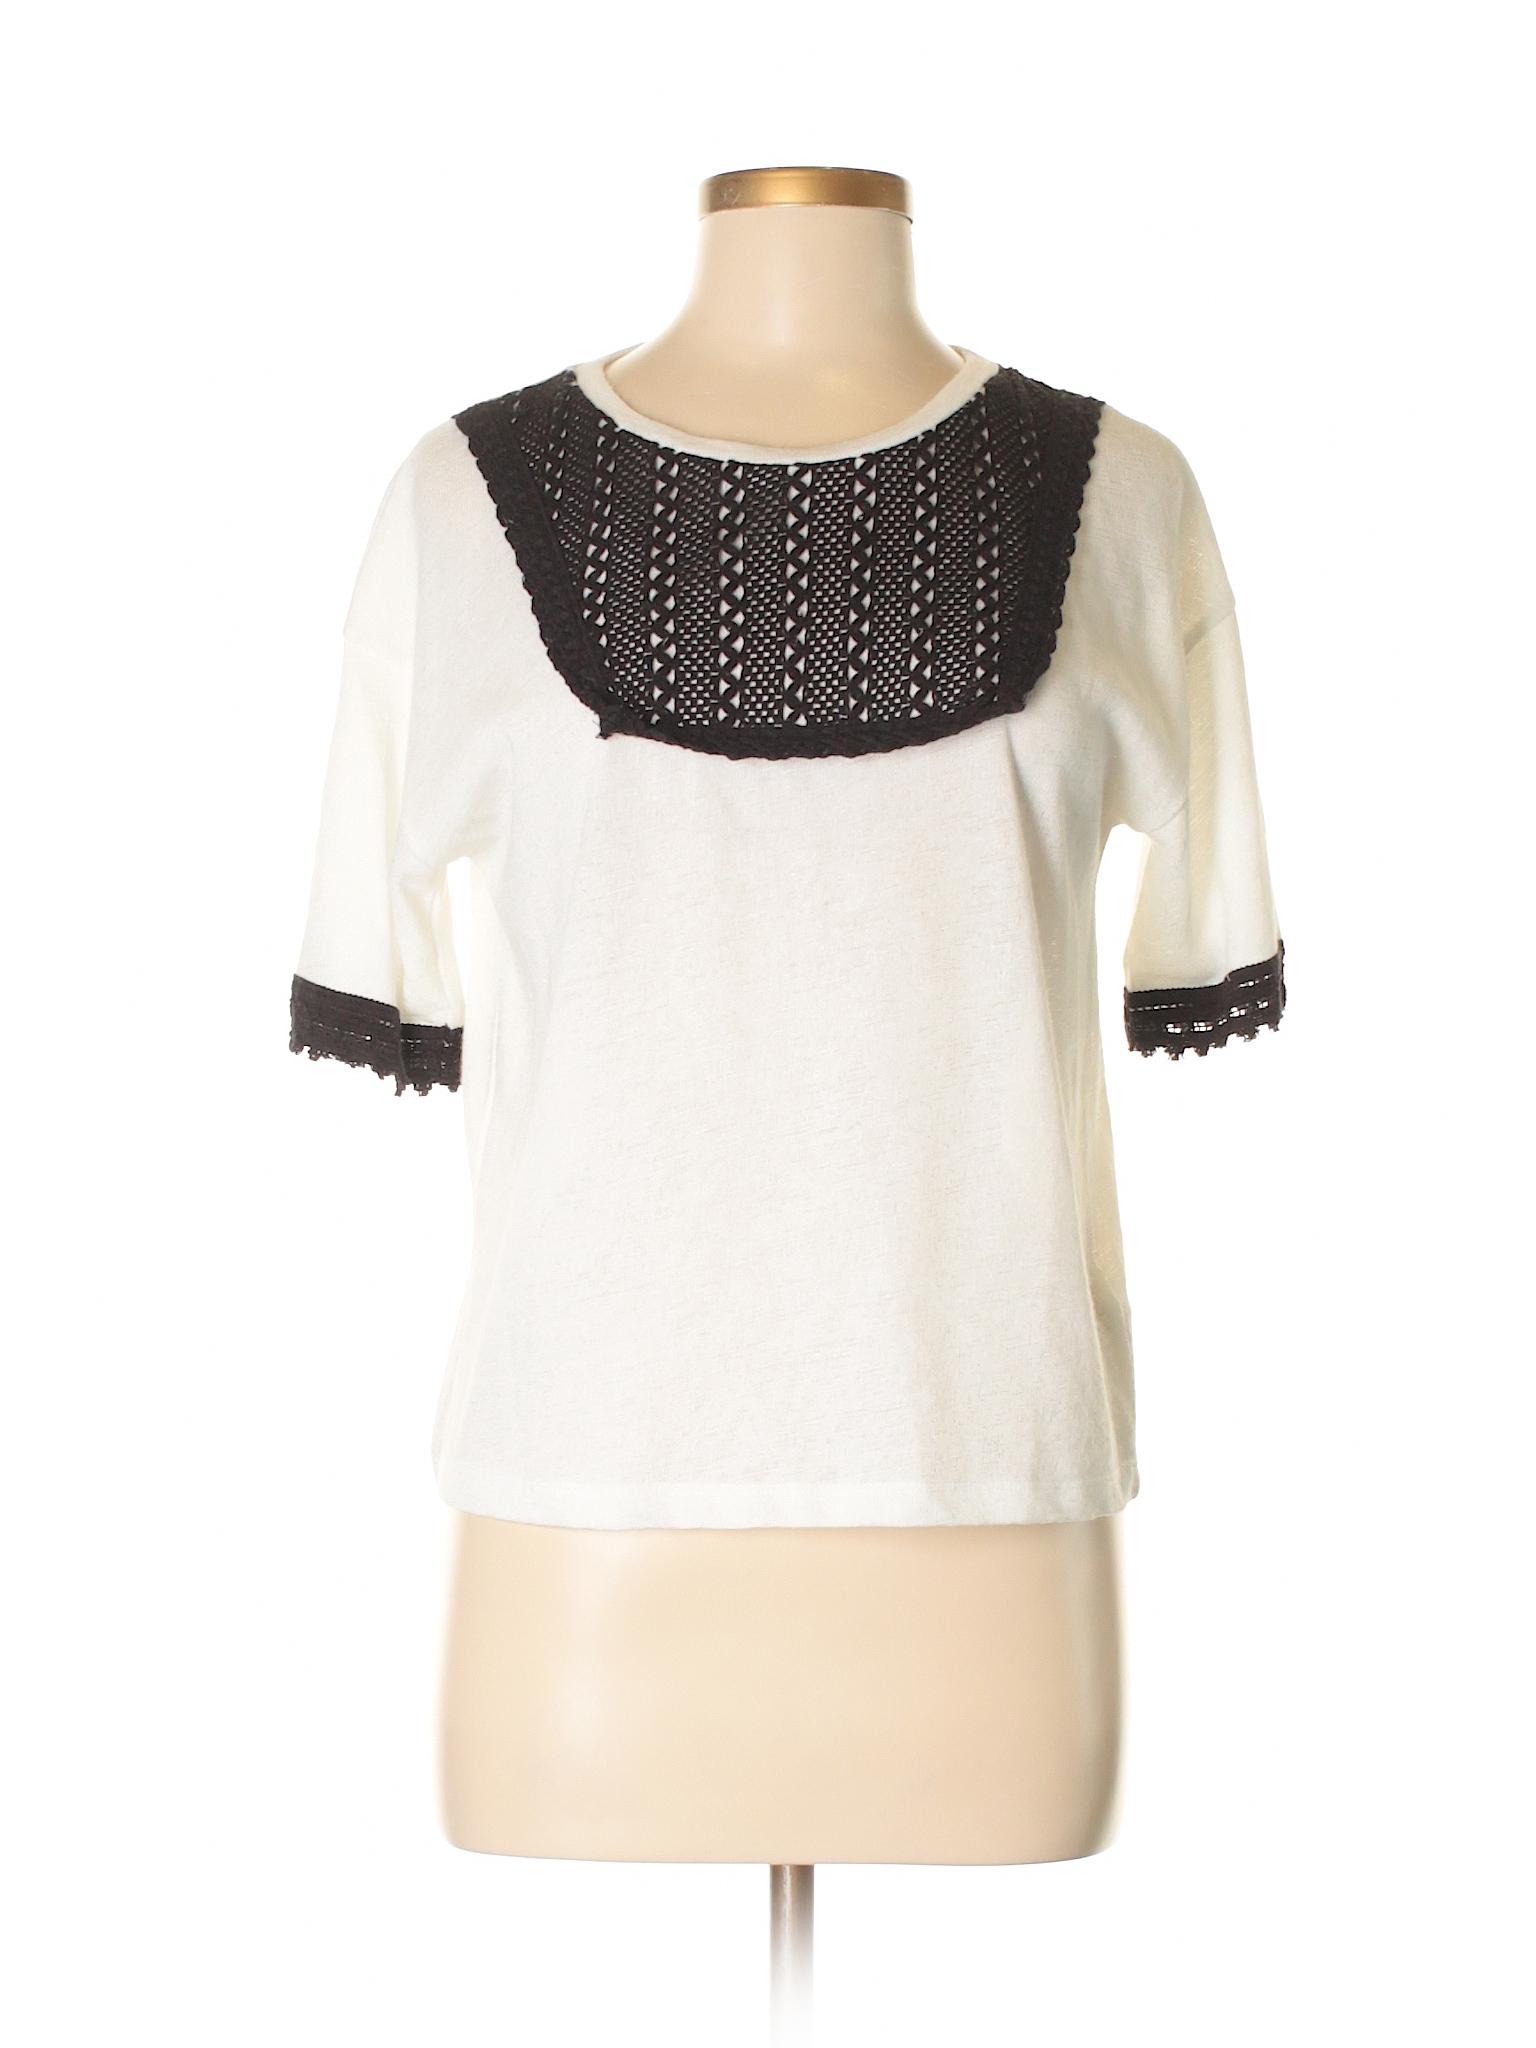 Topshop Pullover Topshop Boutique Boutique winter winter Sweater zwdq4WBn